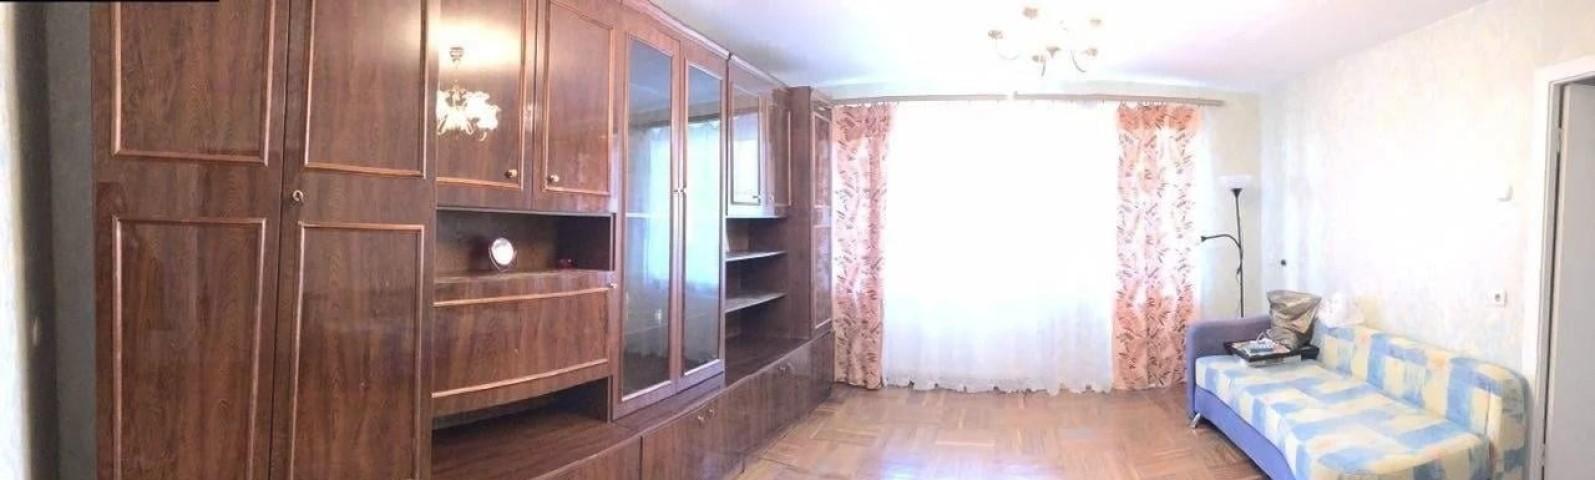 Аренда 2х к. квартиры пр-кт Просвещения, 30 - фото 2 из 4